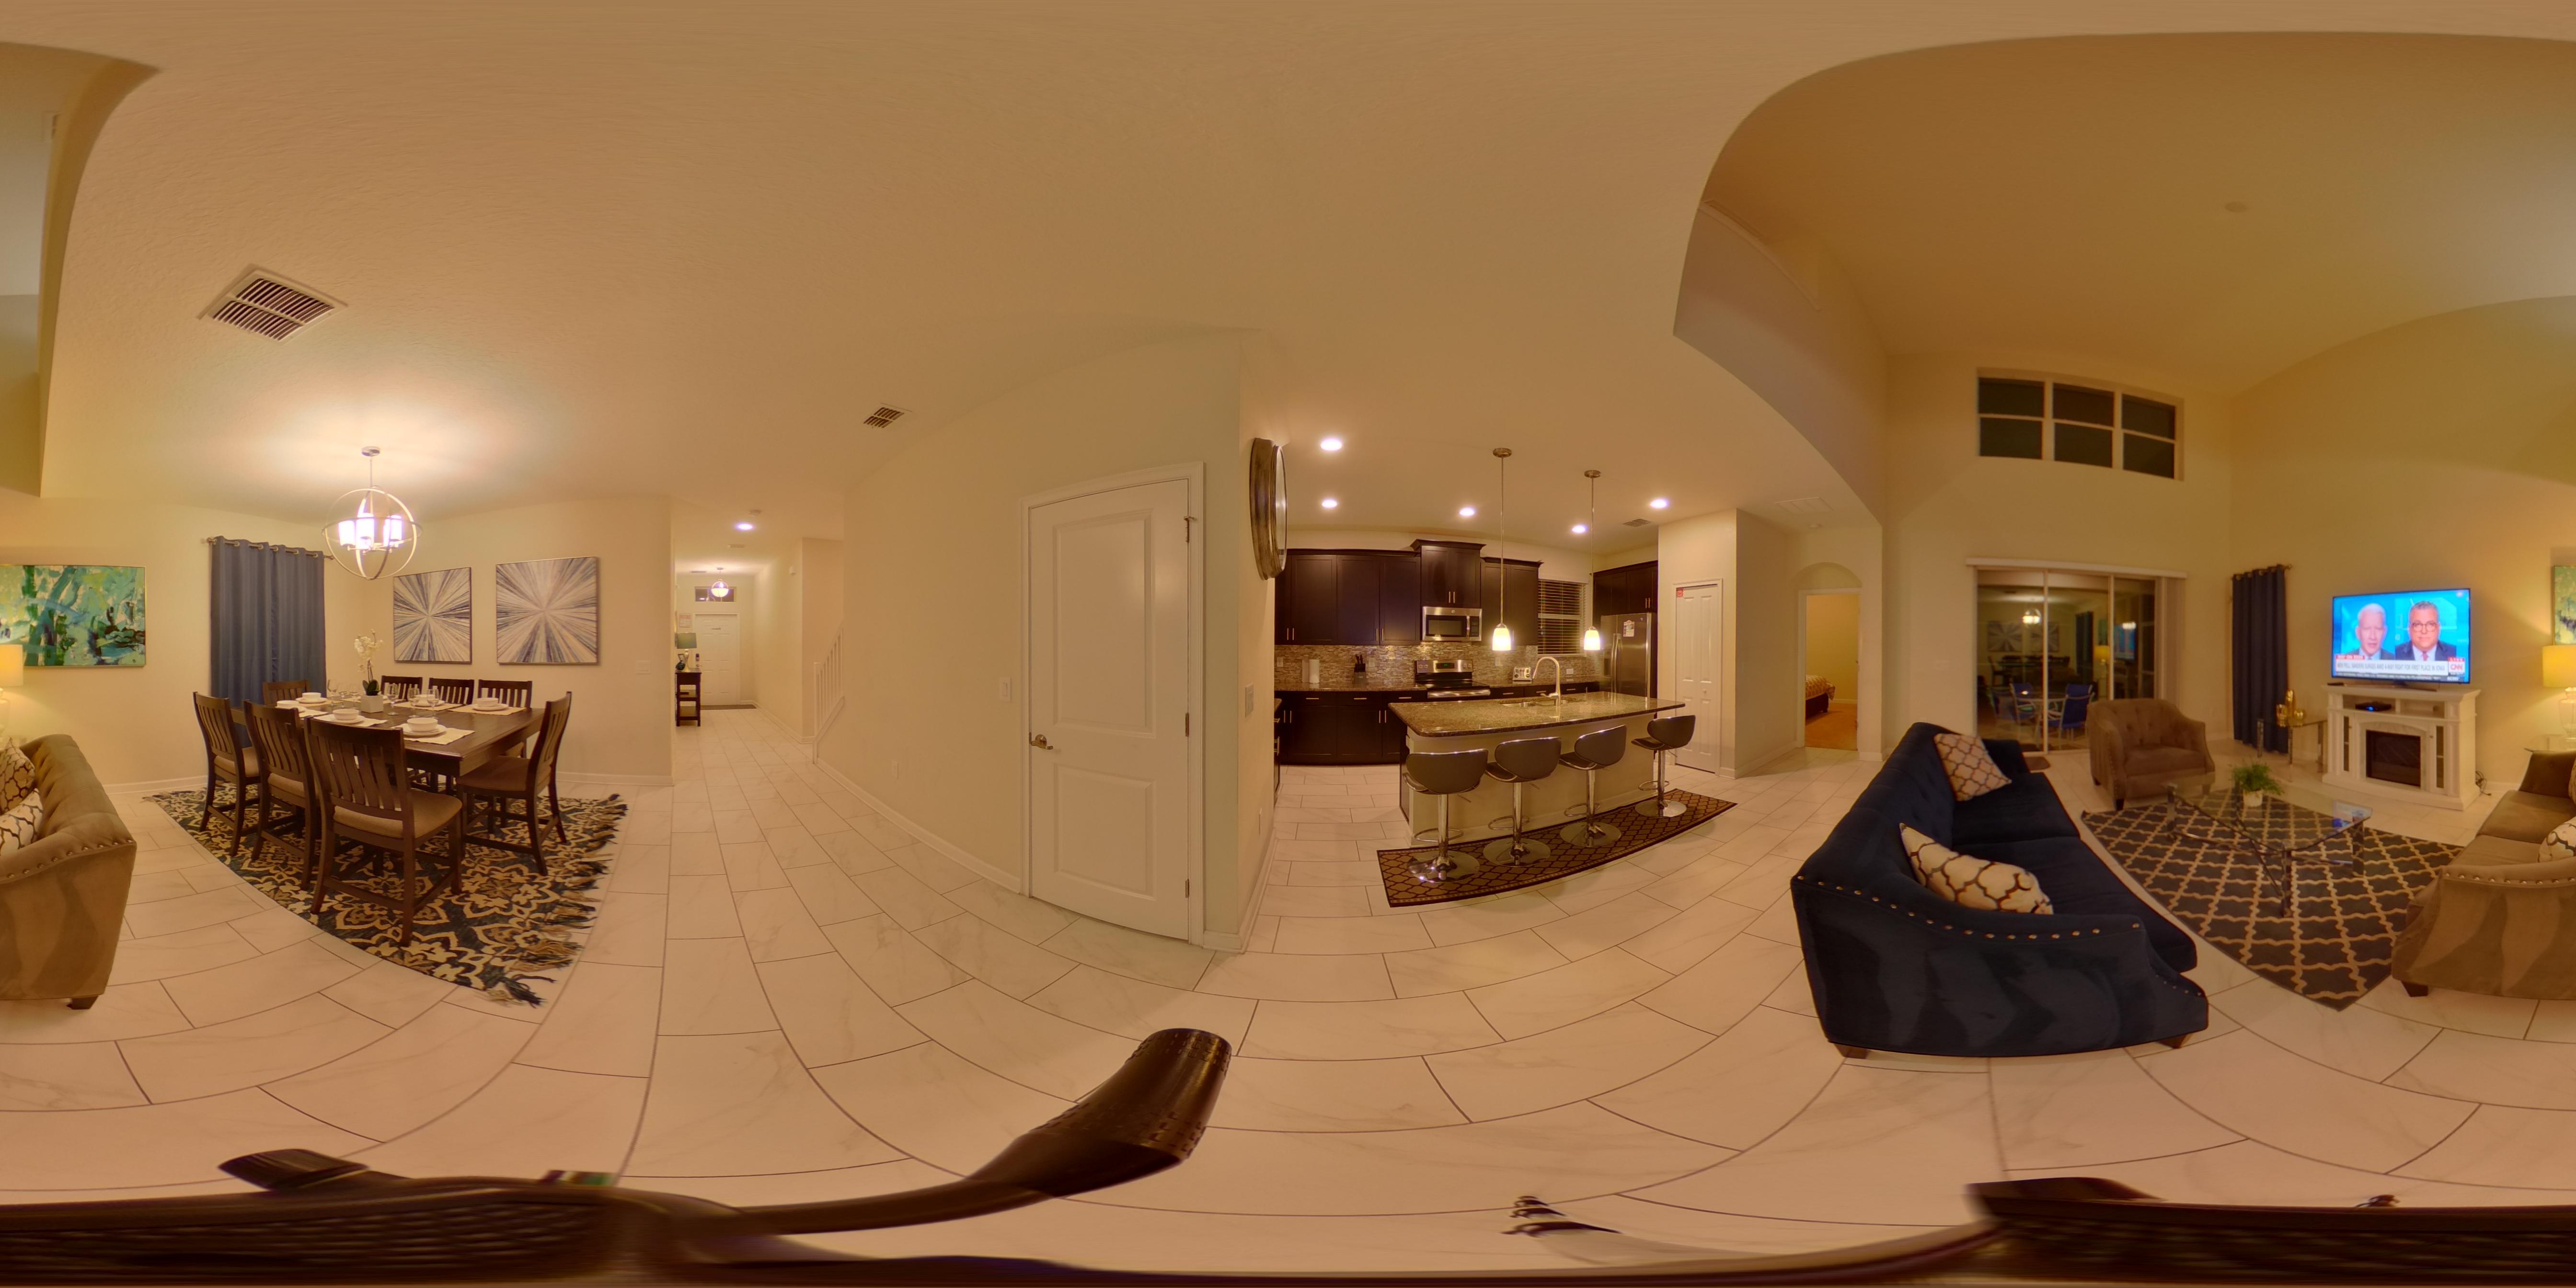 Apartment Villa  10 min from Disney  Golf  Wetpark all new photo 24719411